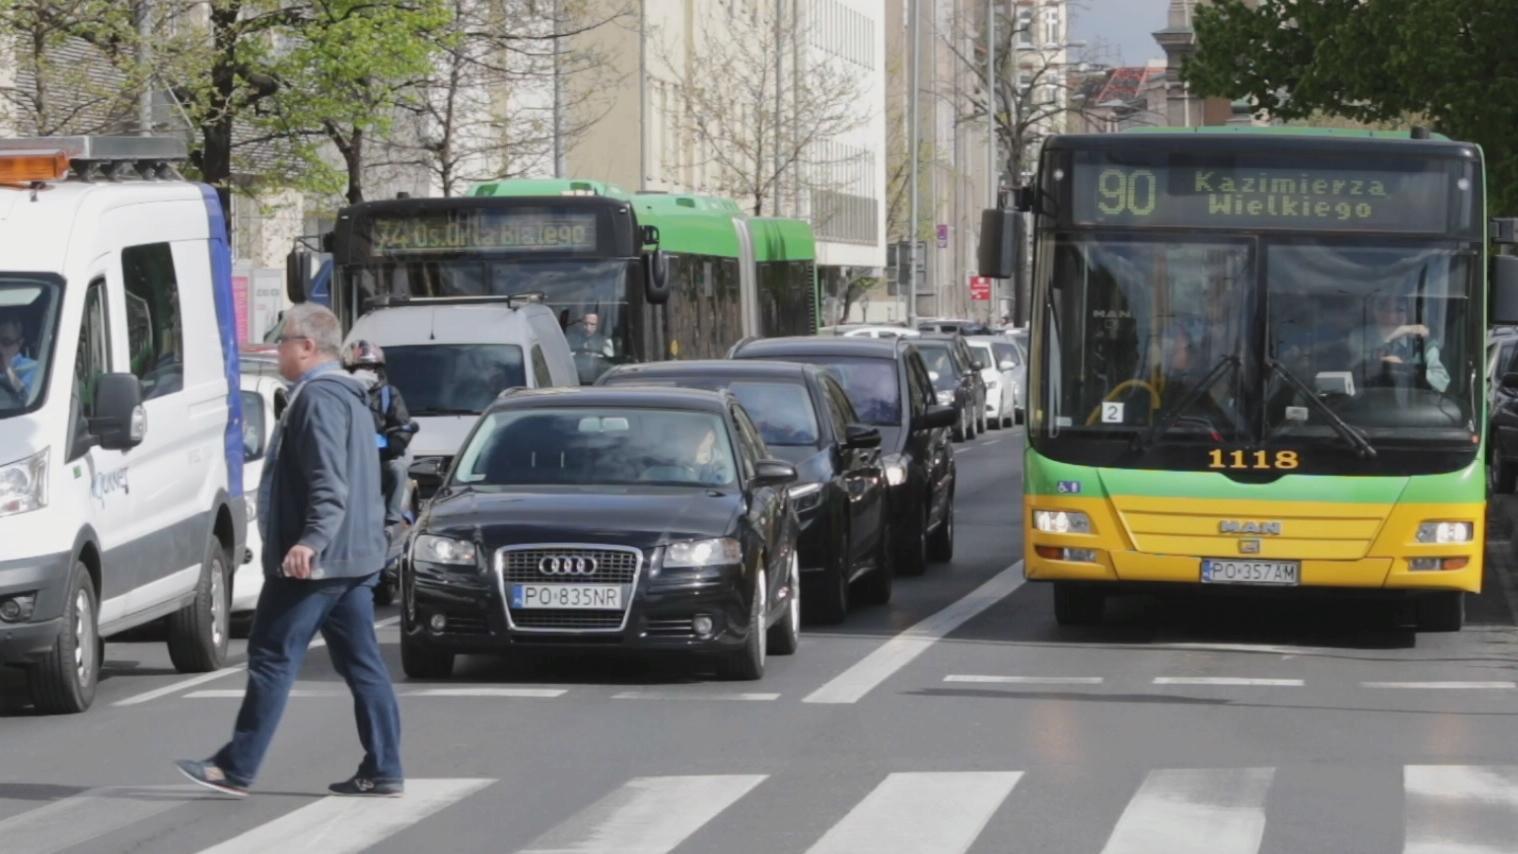 ulica garbary - UMP